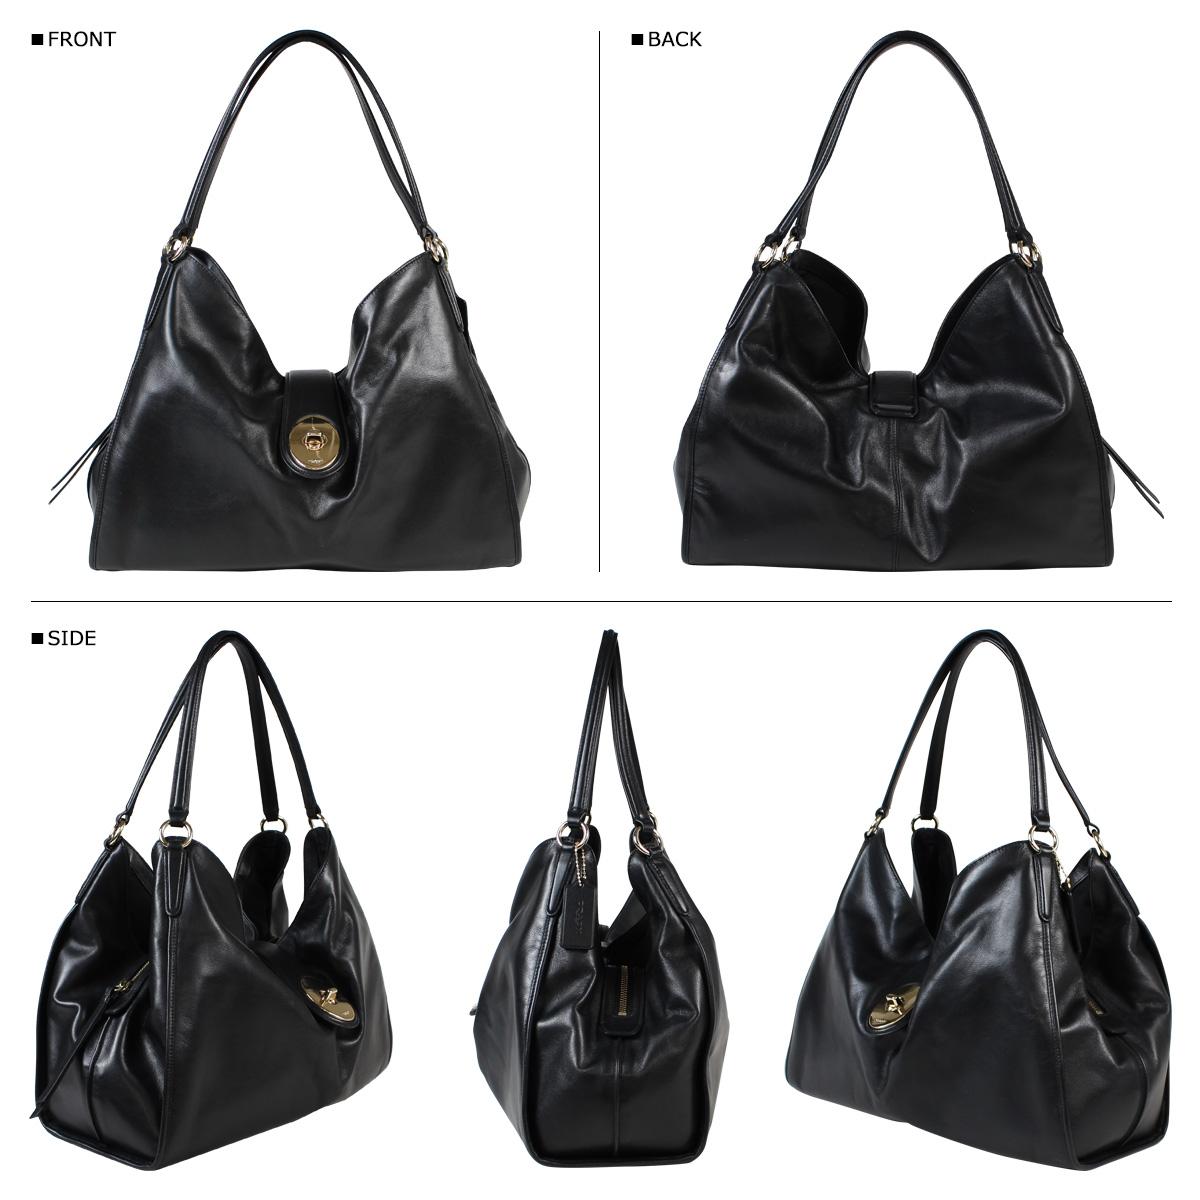 My New Coach Bag Handbag F37637 Black Womens 823 Back In Stock